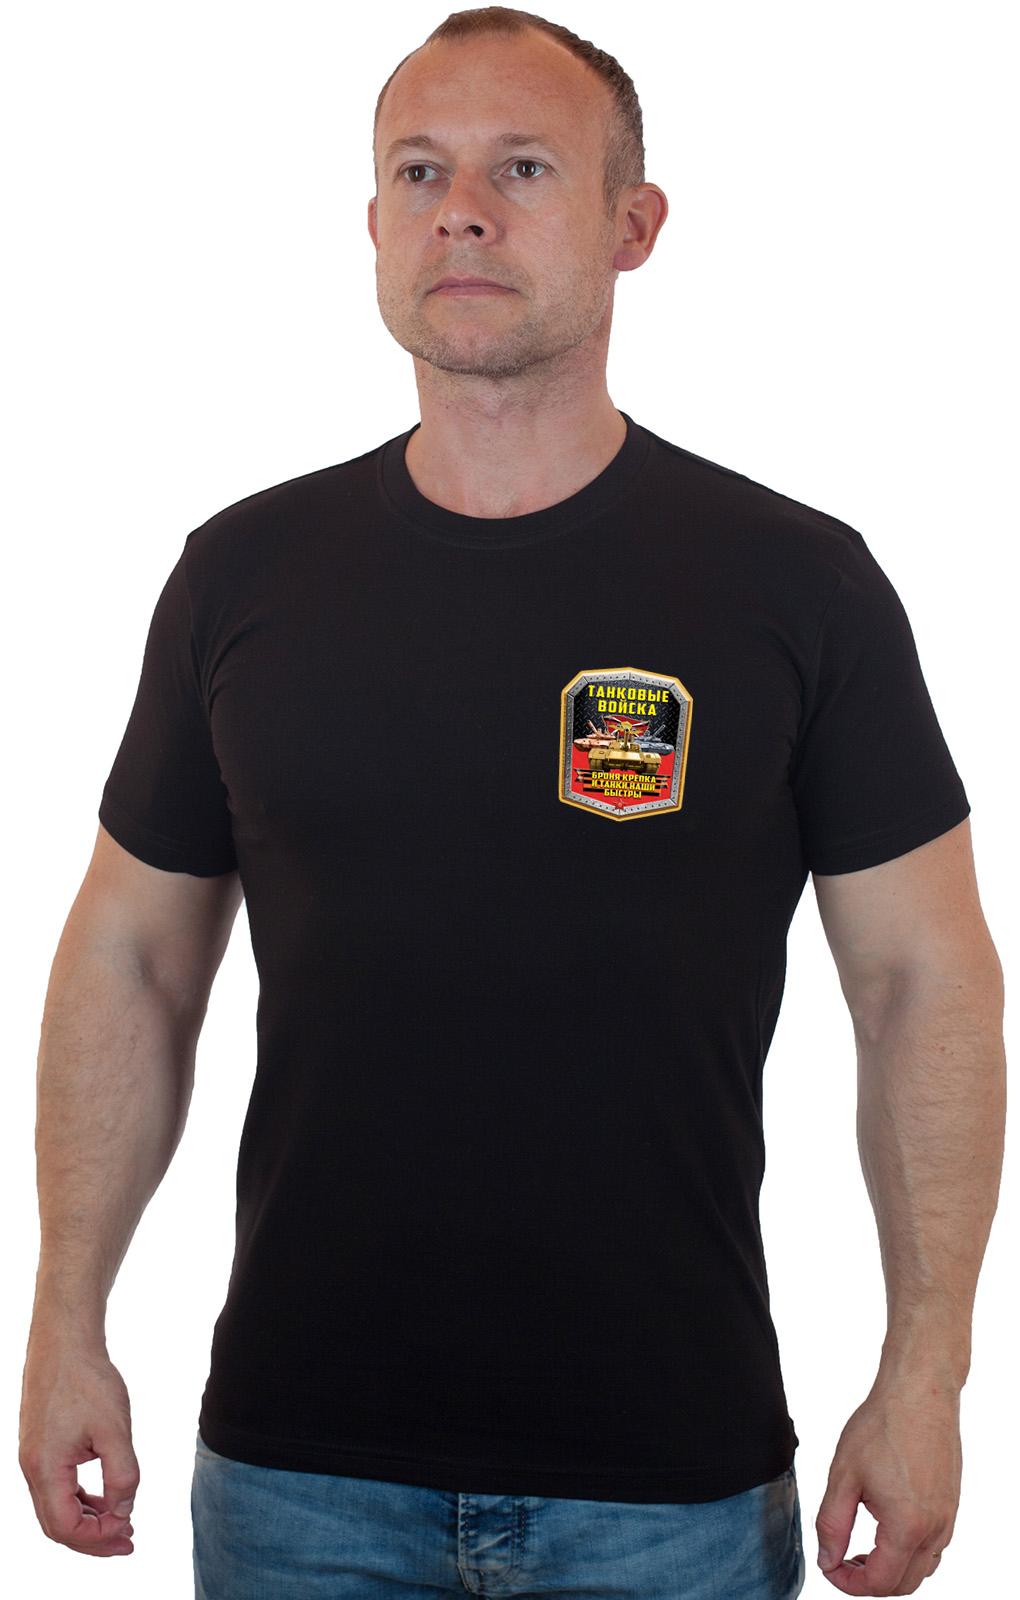 Купить в военторге Военпро крутую футболку на подарок танкисту